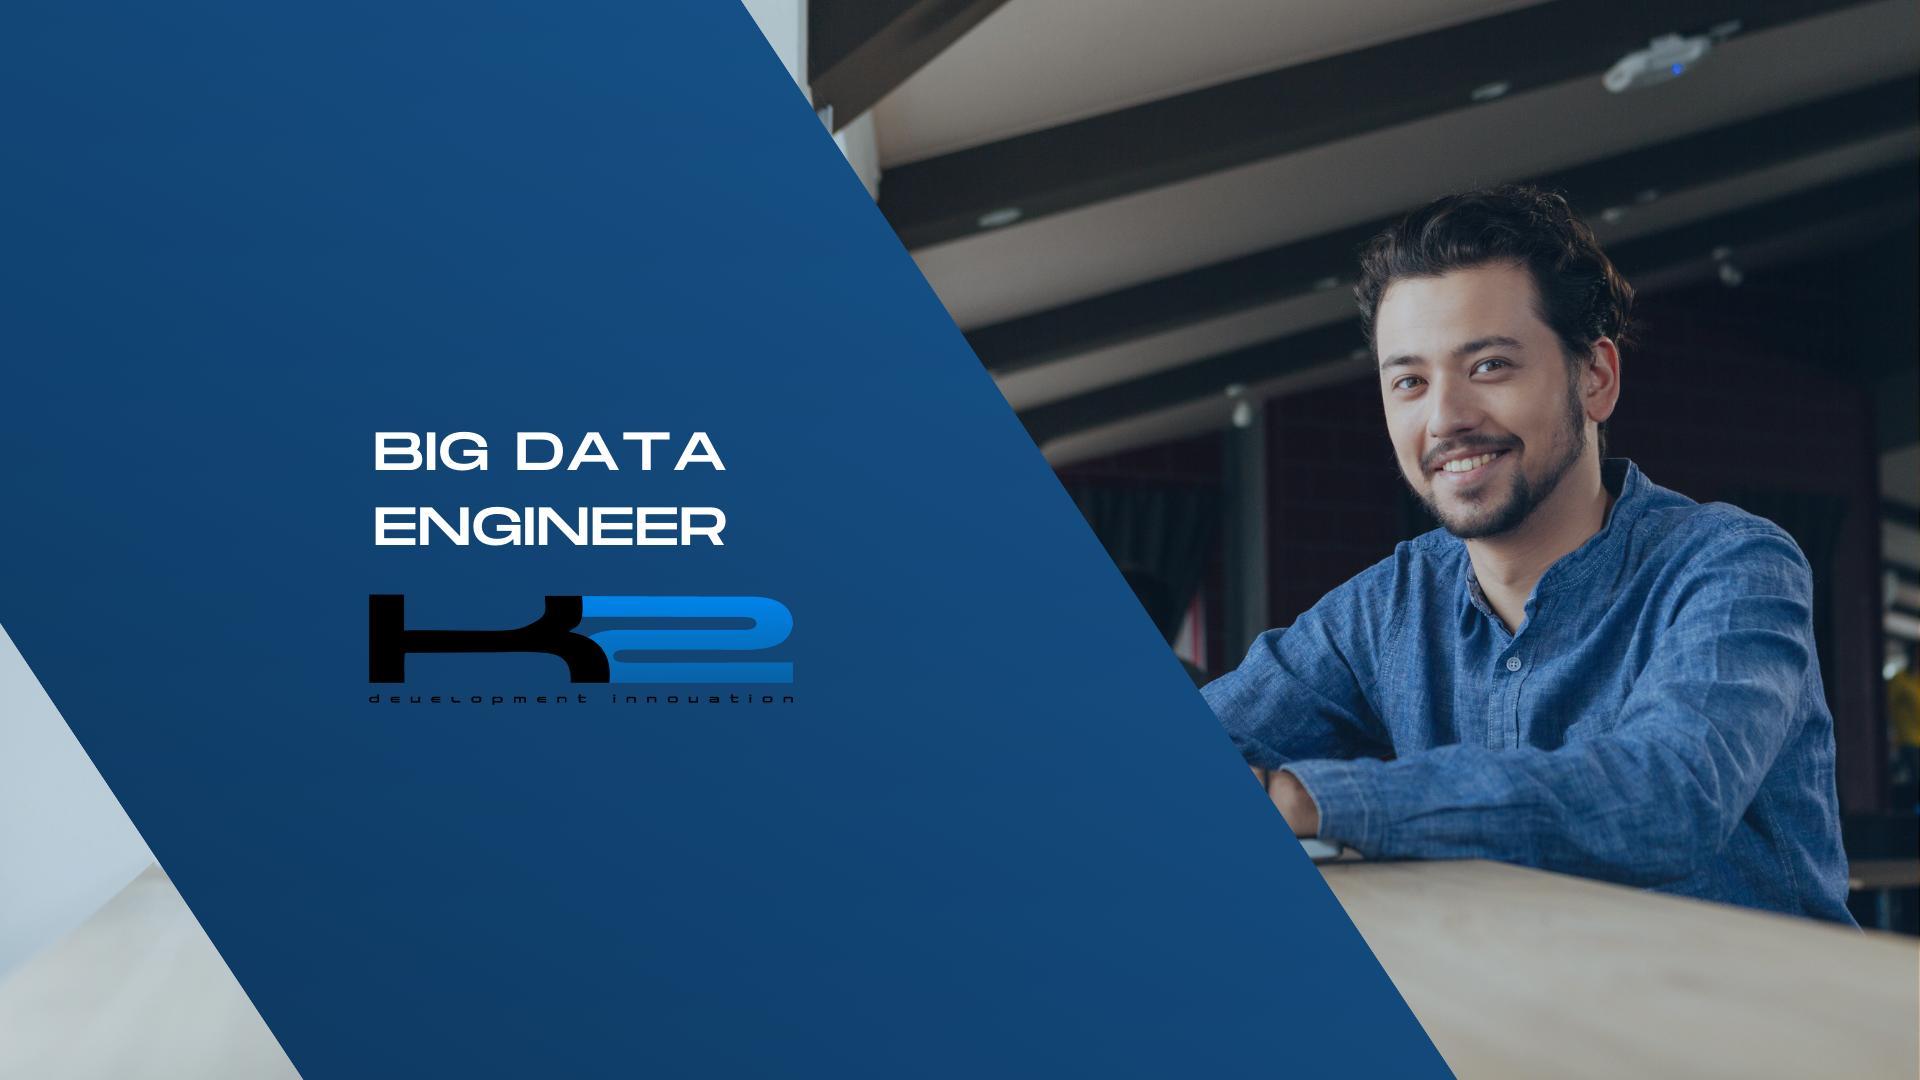 Big data engineer